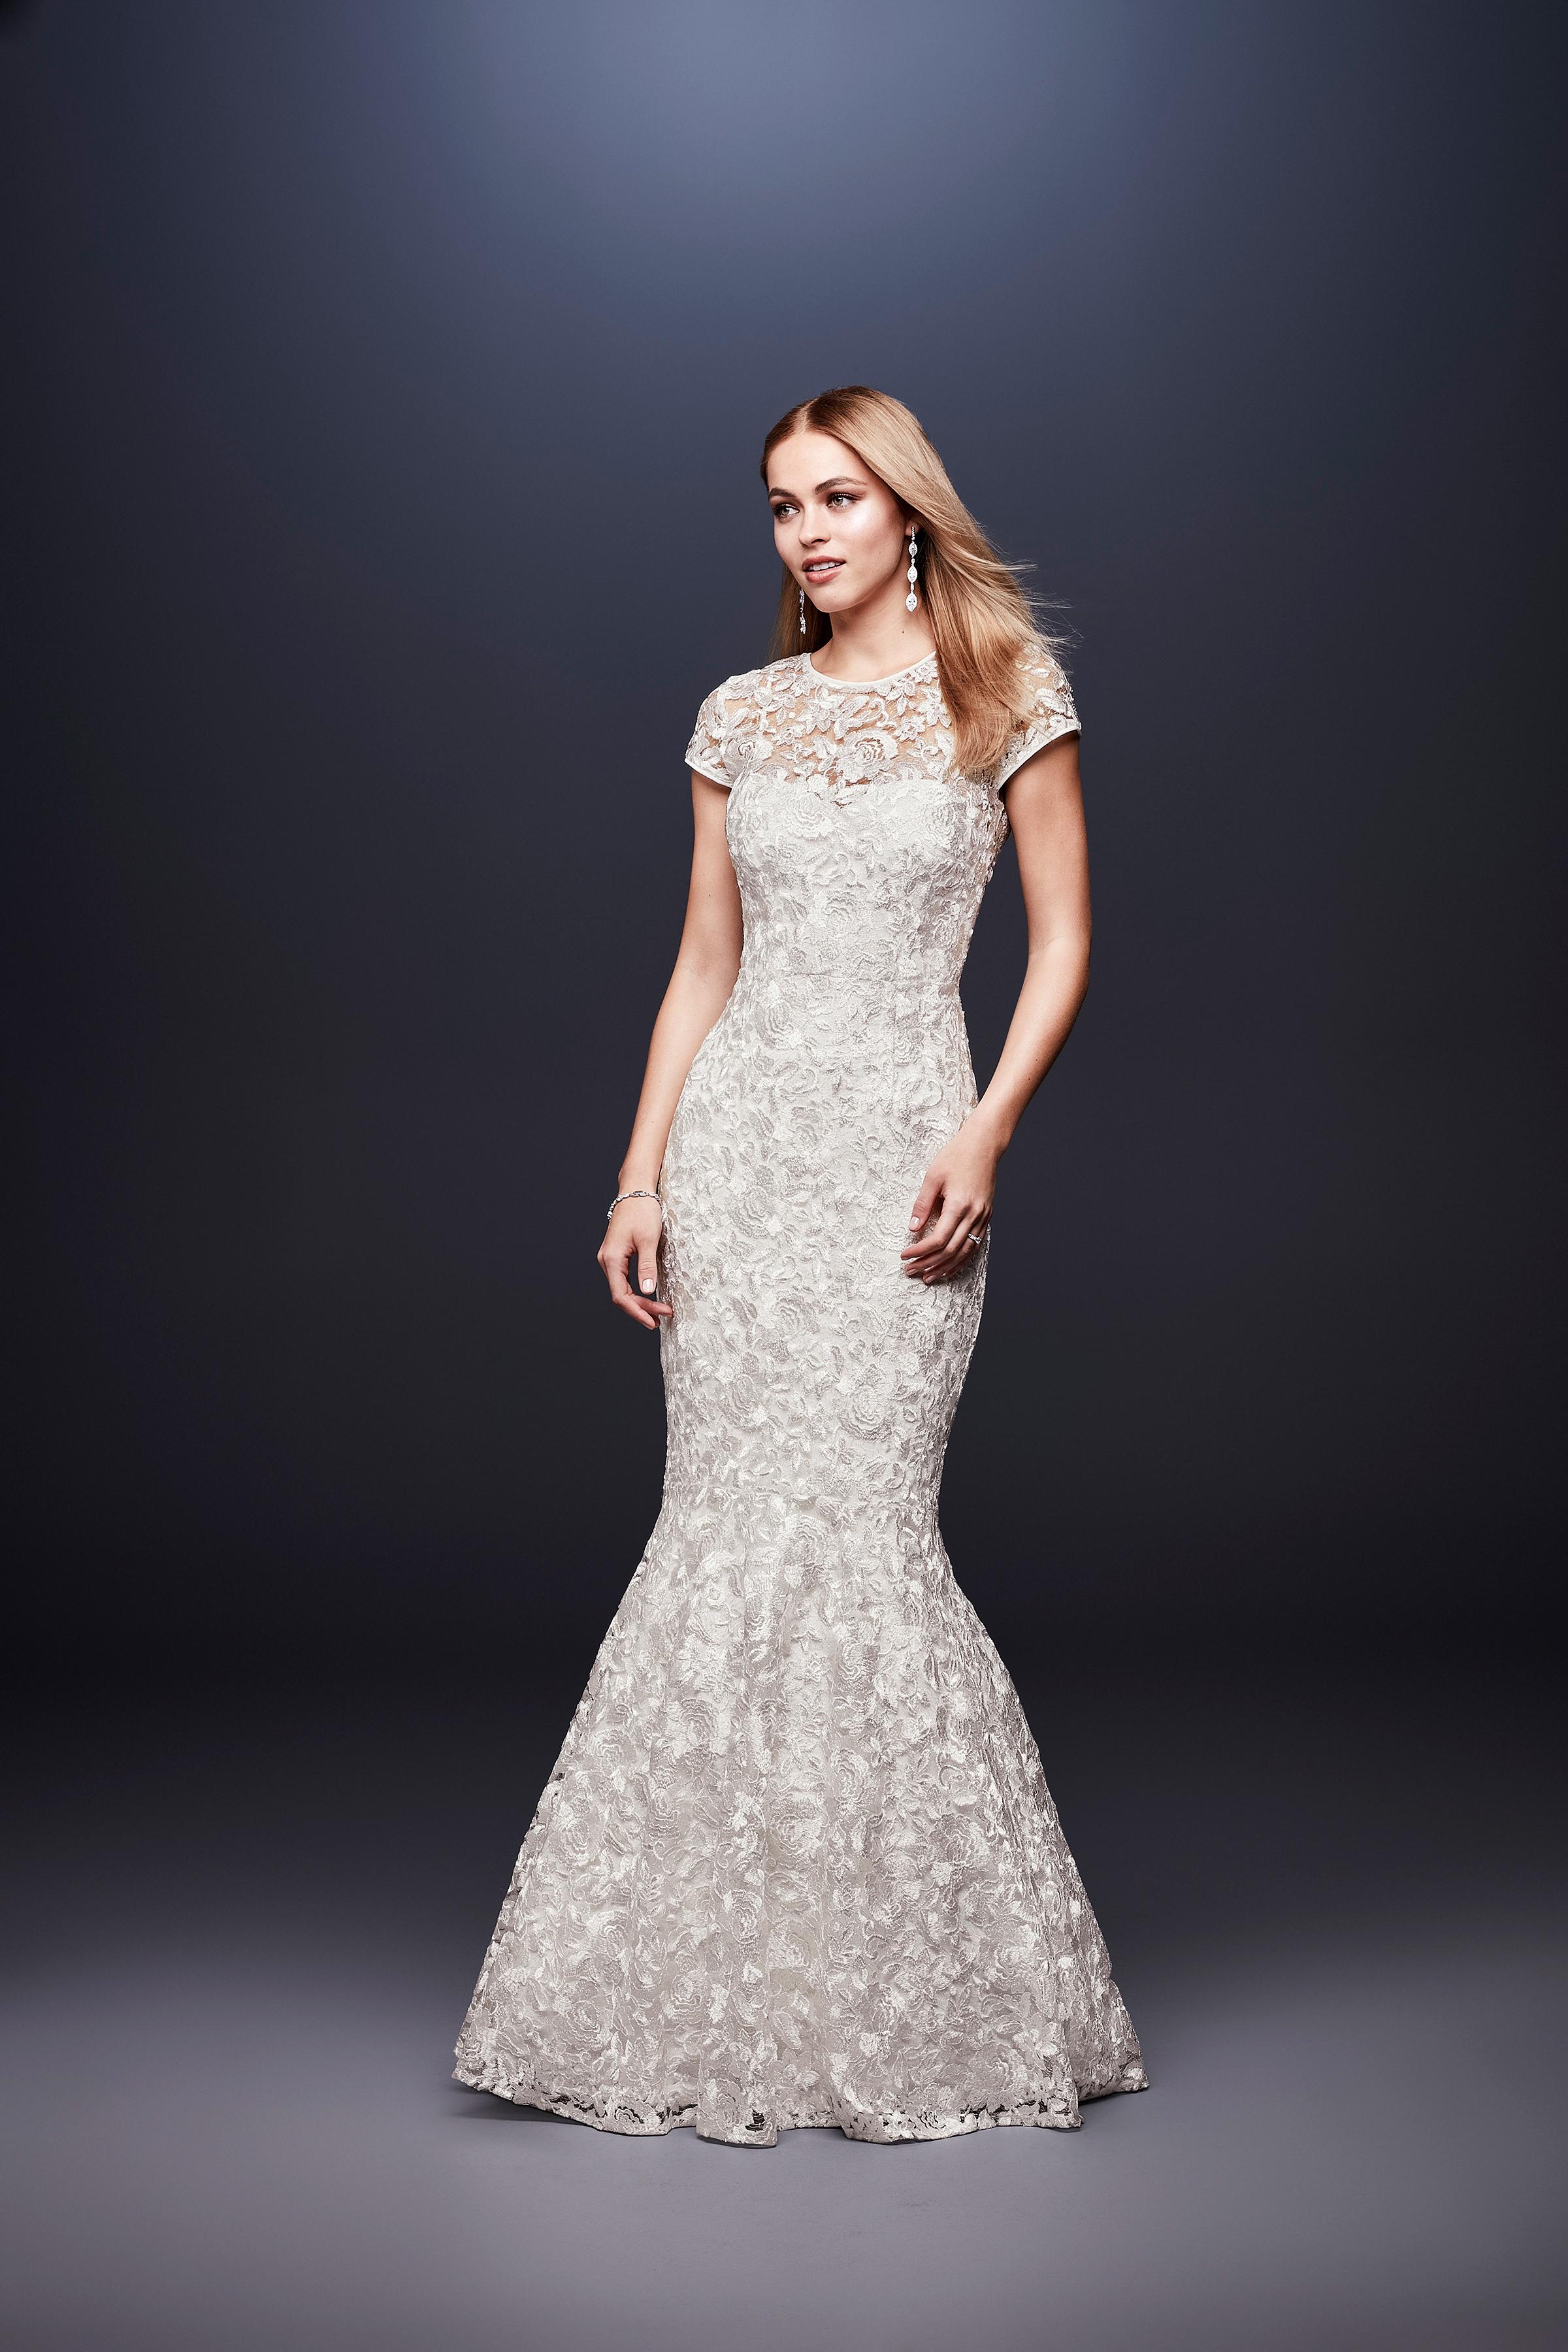 david bridal wedding dress spring 2019 short sleeves lace mermaid